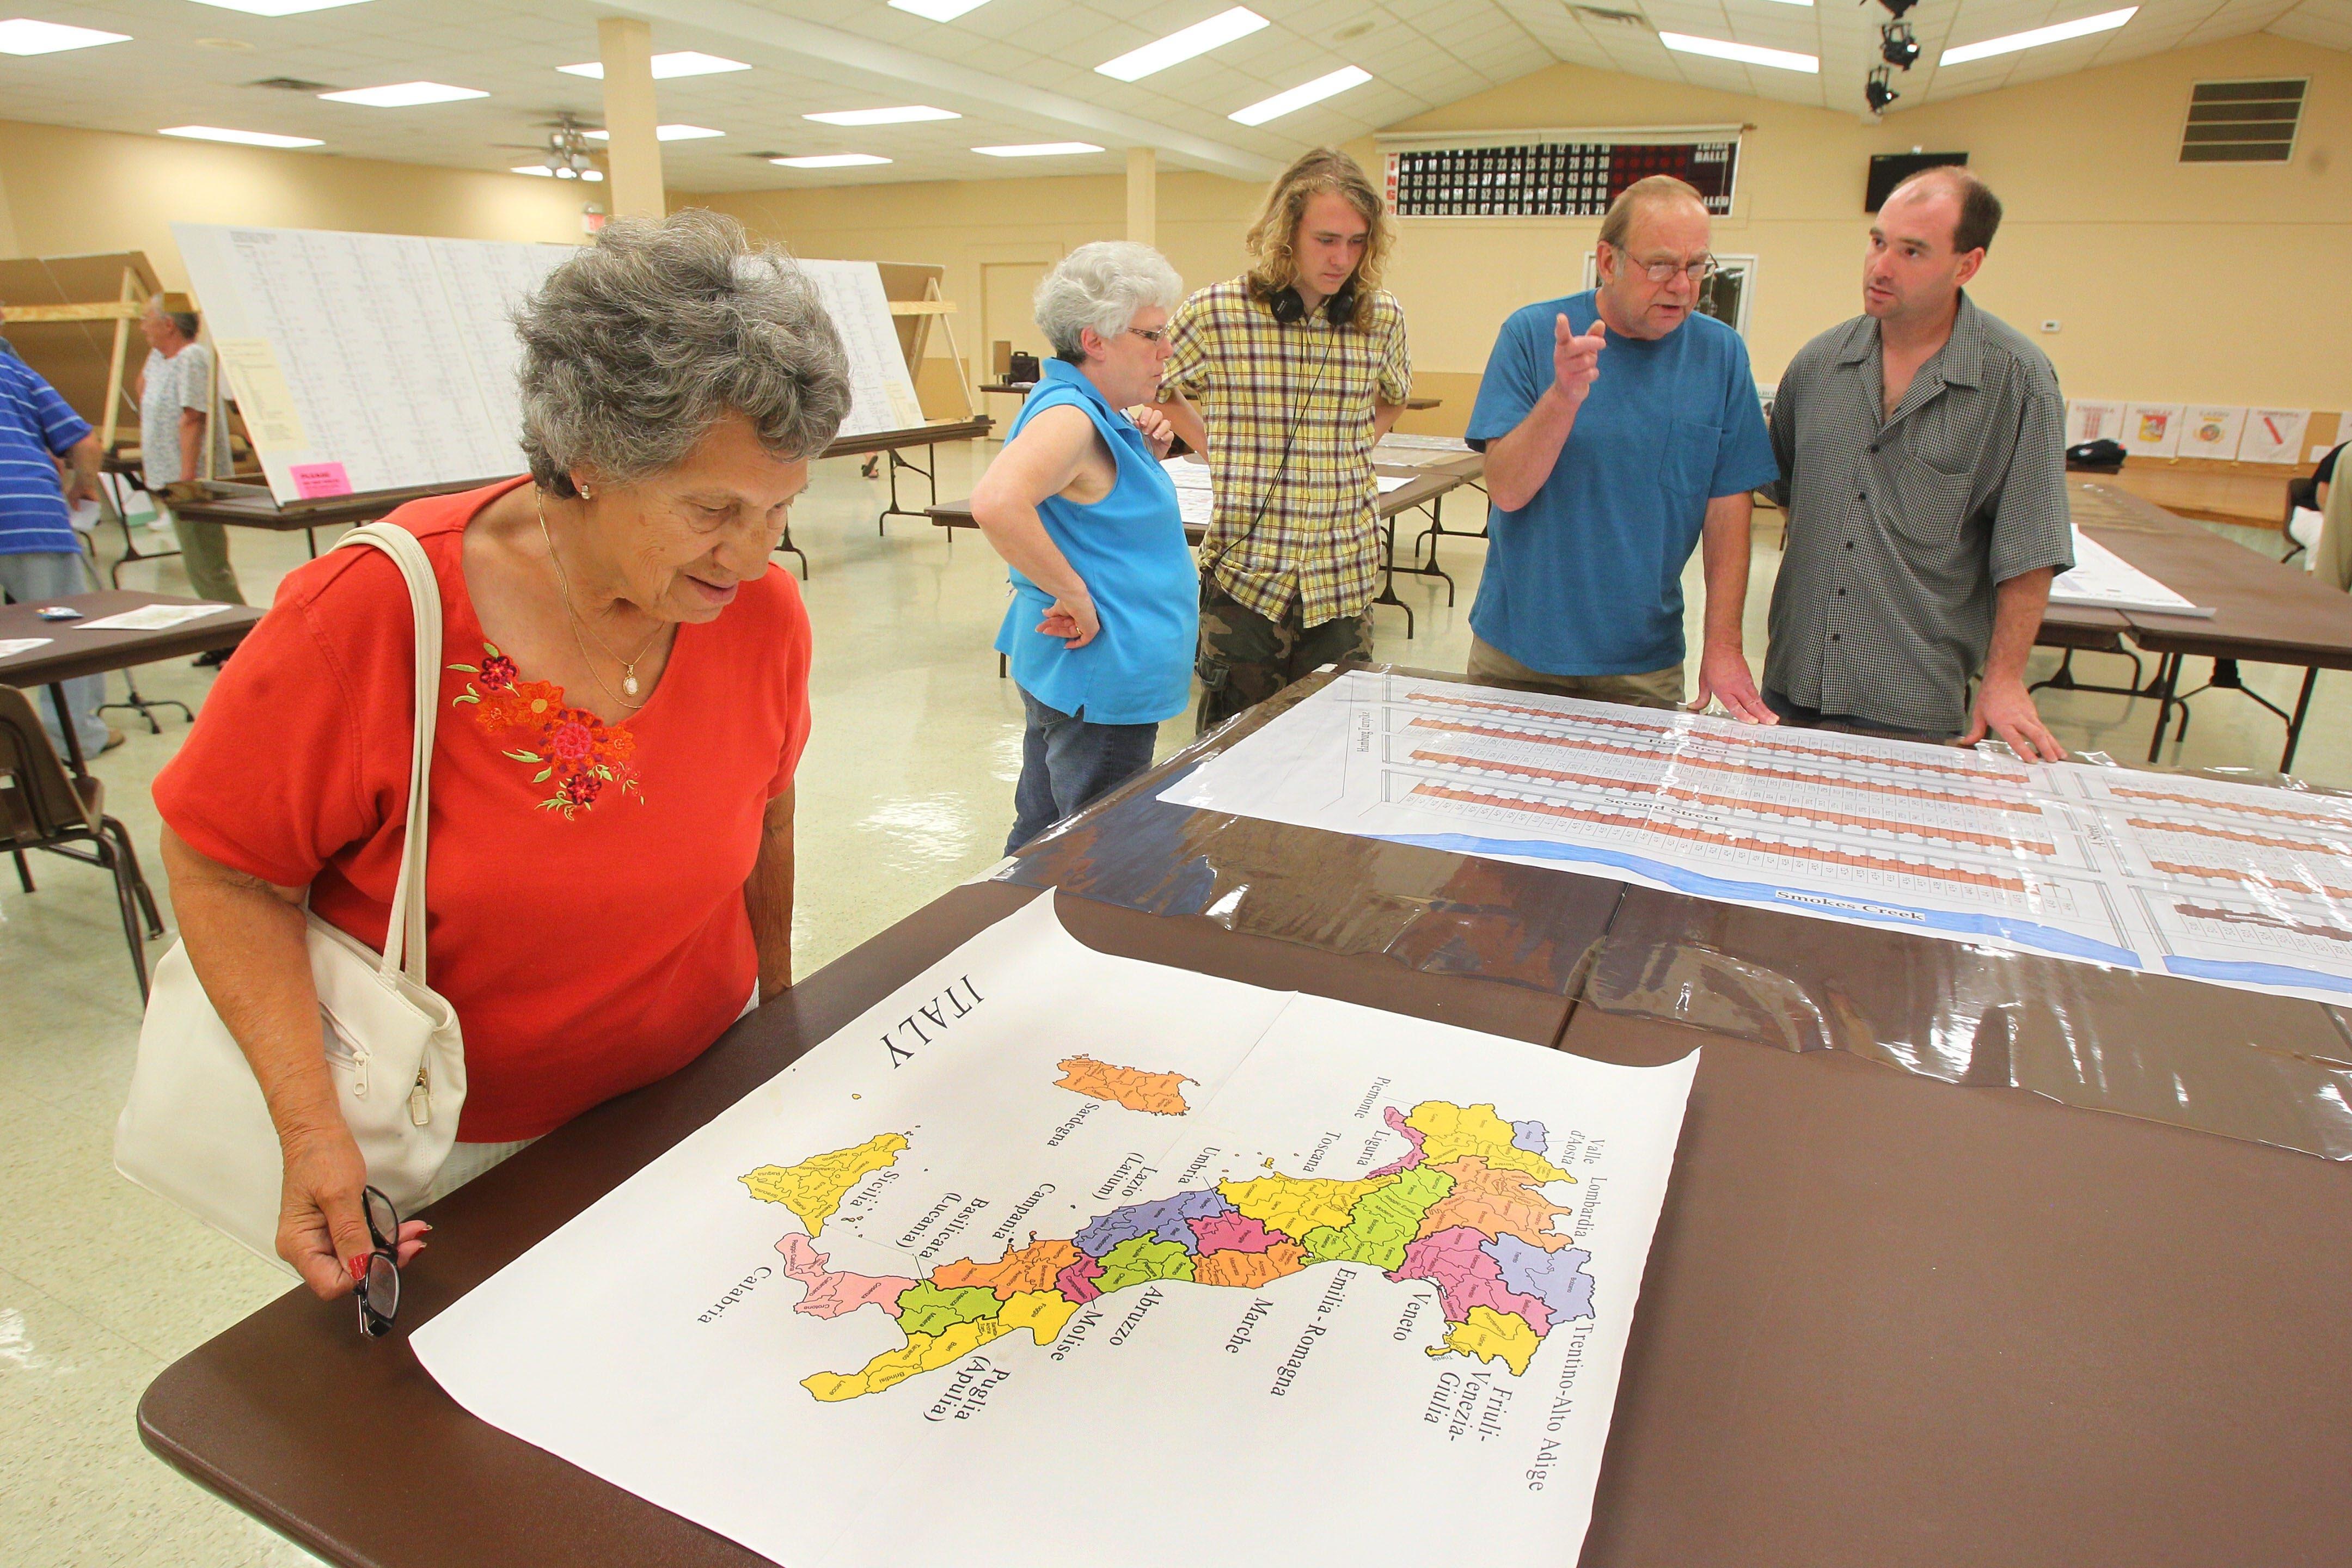 Mickey Andreozzi looks at a map of Italy on Saturday during the Lackawanna Italian Heritage Celebration.